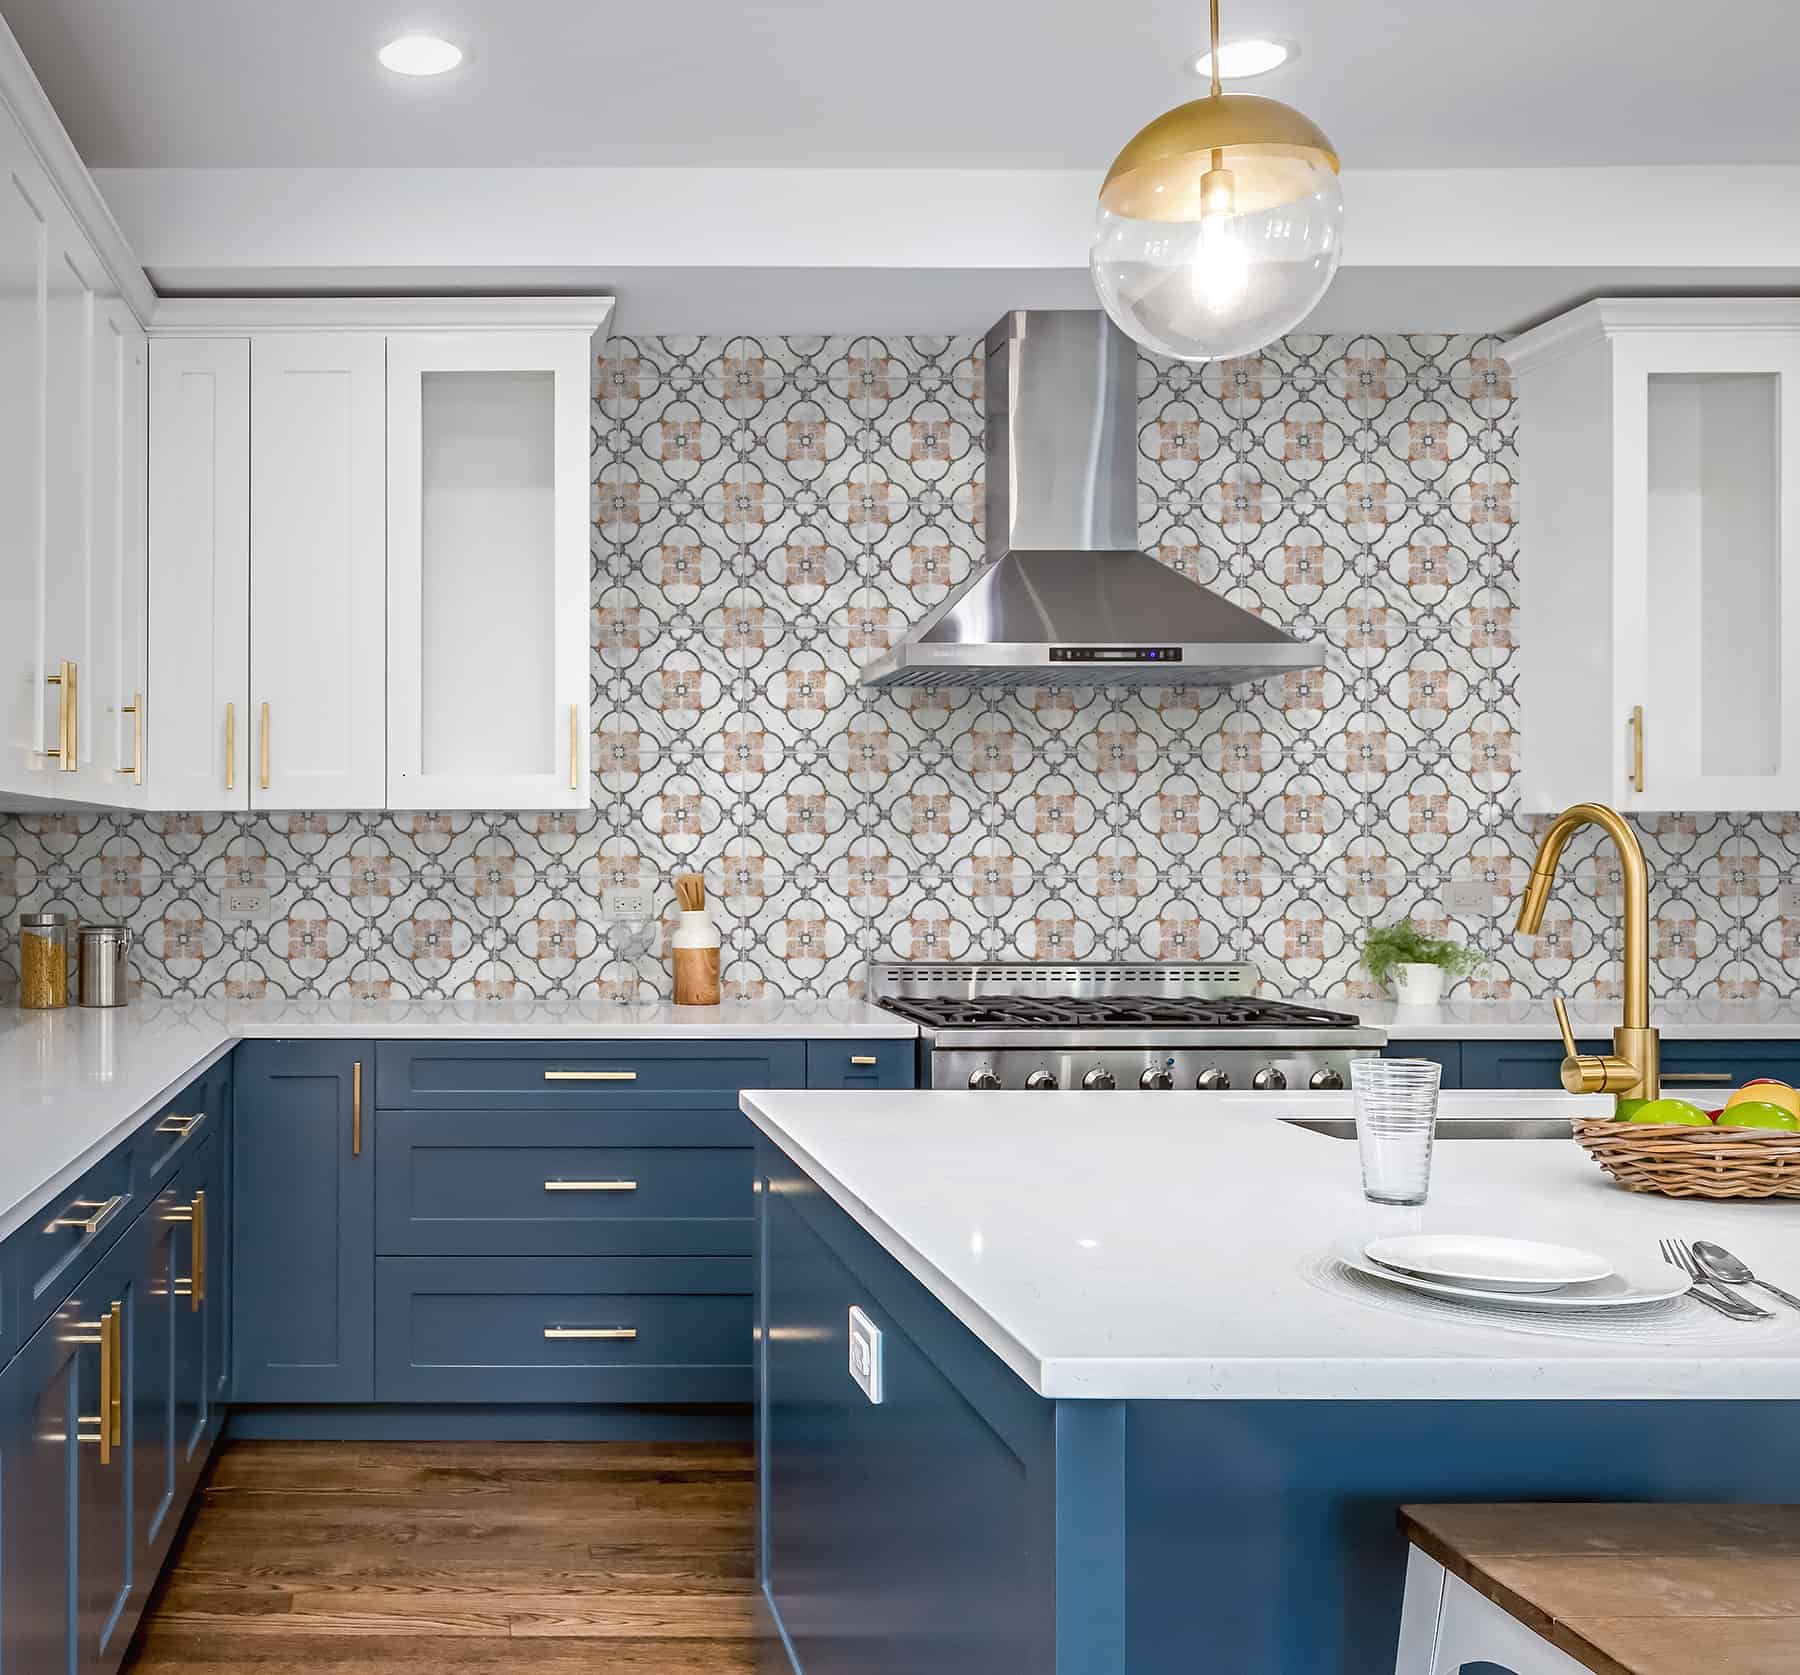 Chime (Blush) Carrara Kitchen Backsplash